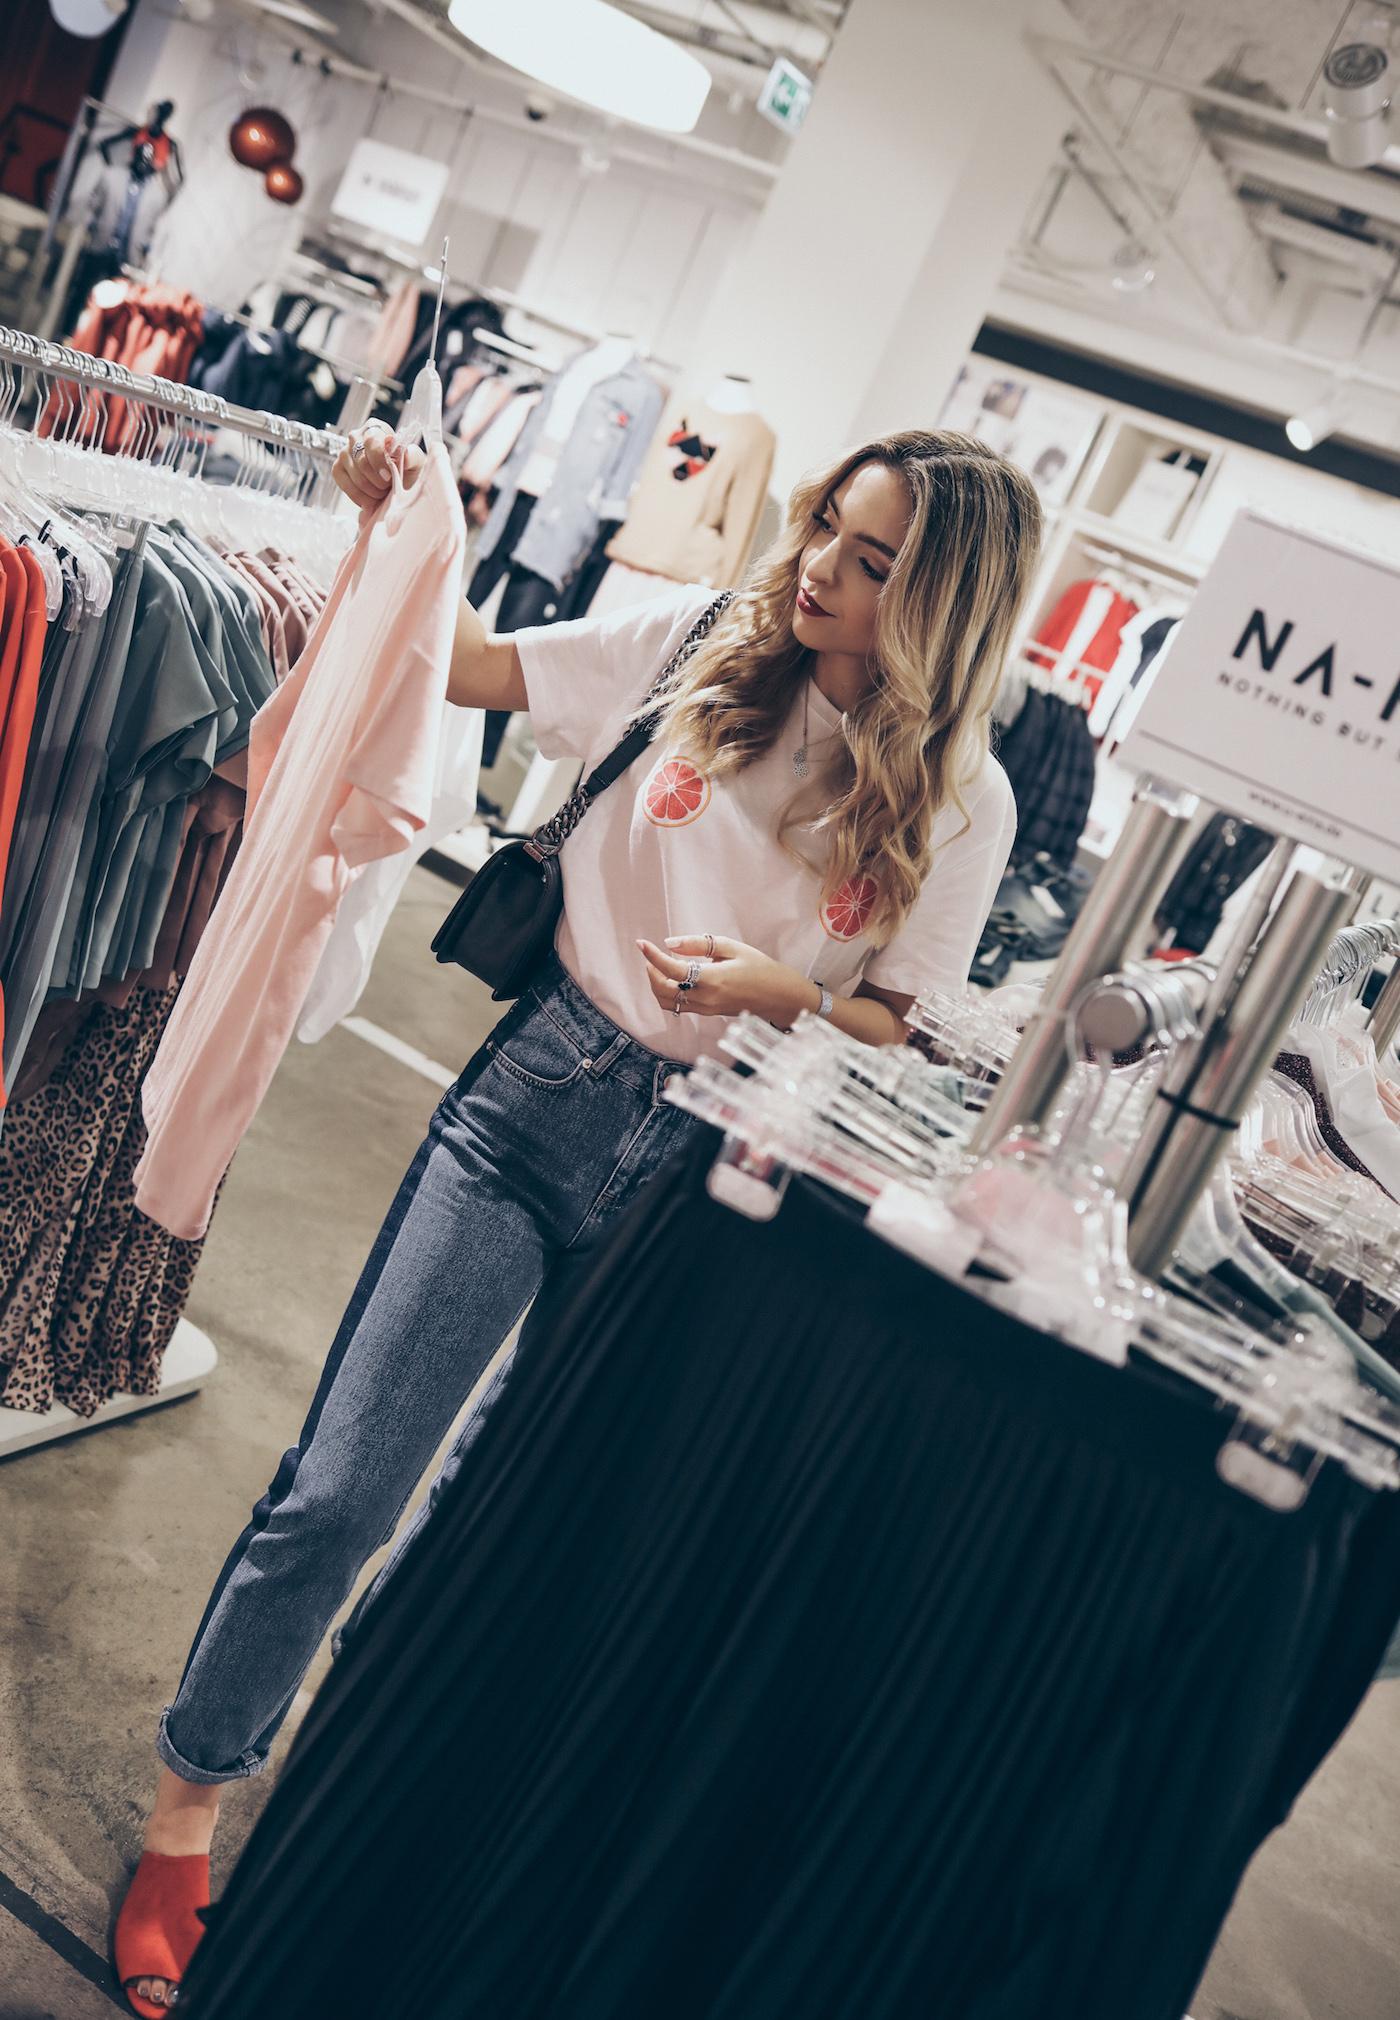 U-Eins Fashion Store Nürnberg NA-KD Fashion Launch | Want Get Repeat Fashion Blog Erlangen Modeblog